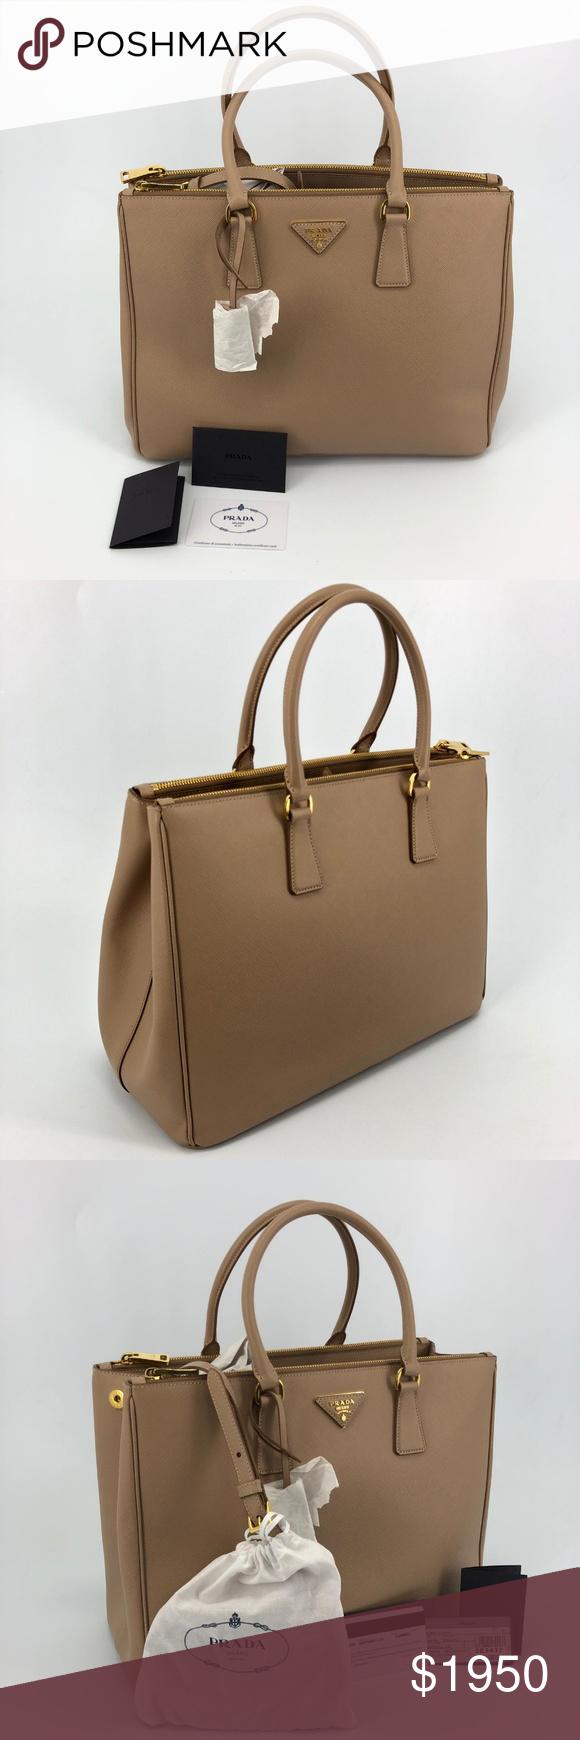 0d6d4dedb05c ... official store prada saffiano medium double zip tote 1ba786 prada  saffiano brown leather tote with golden